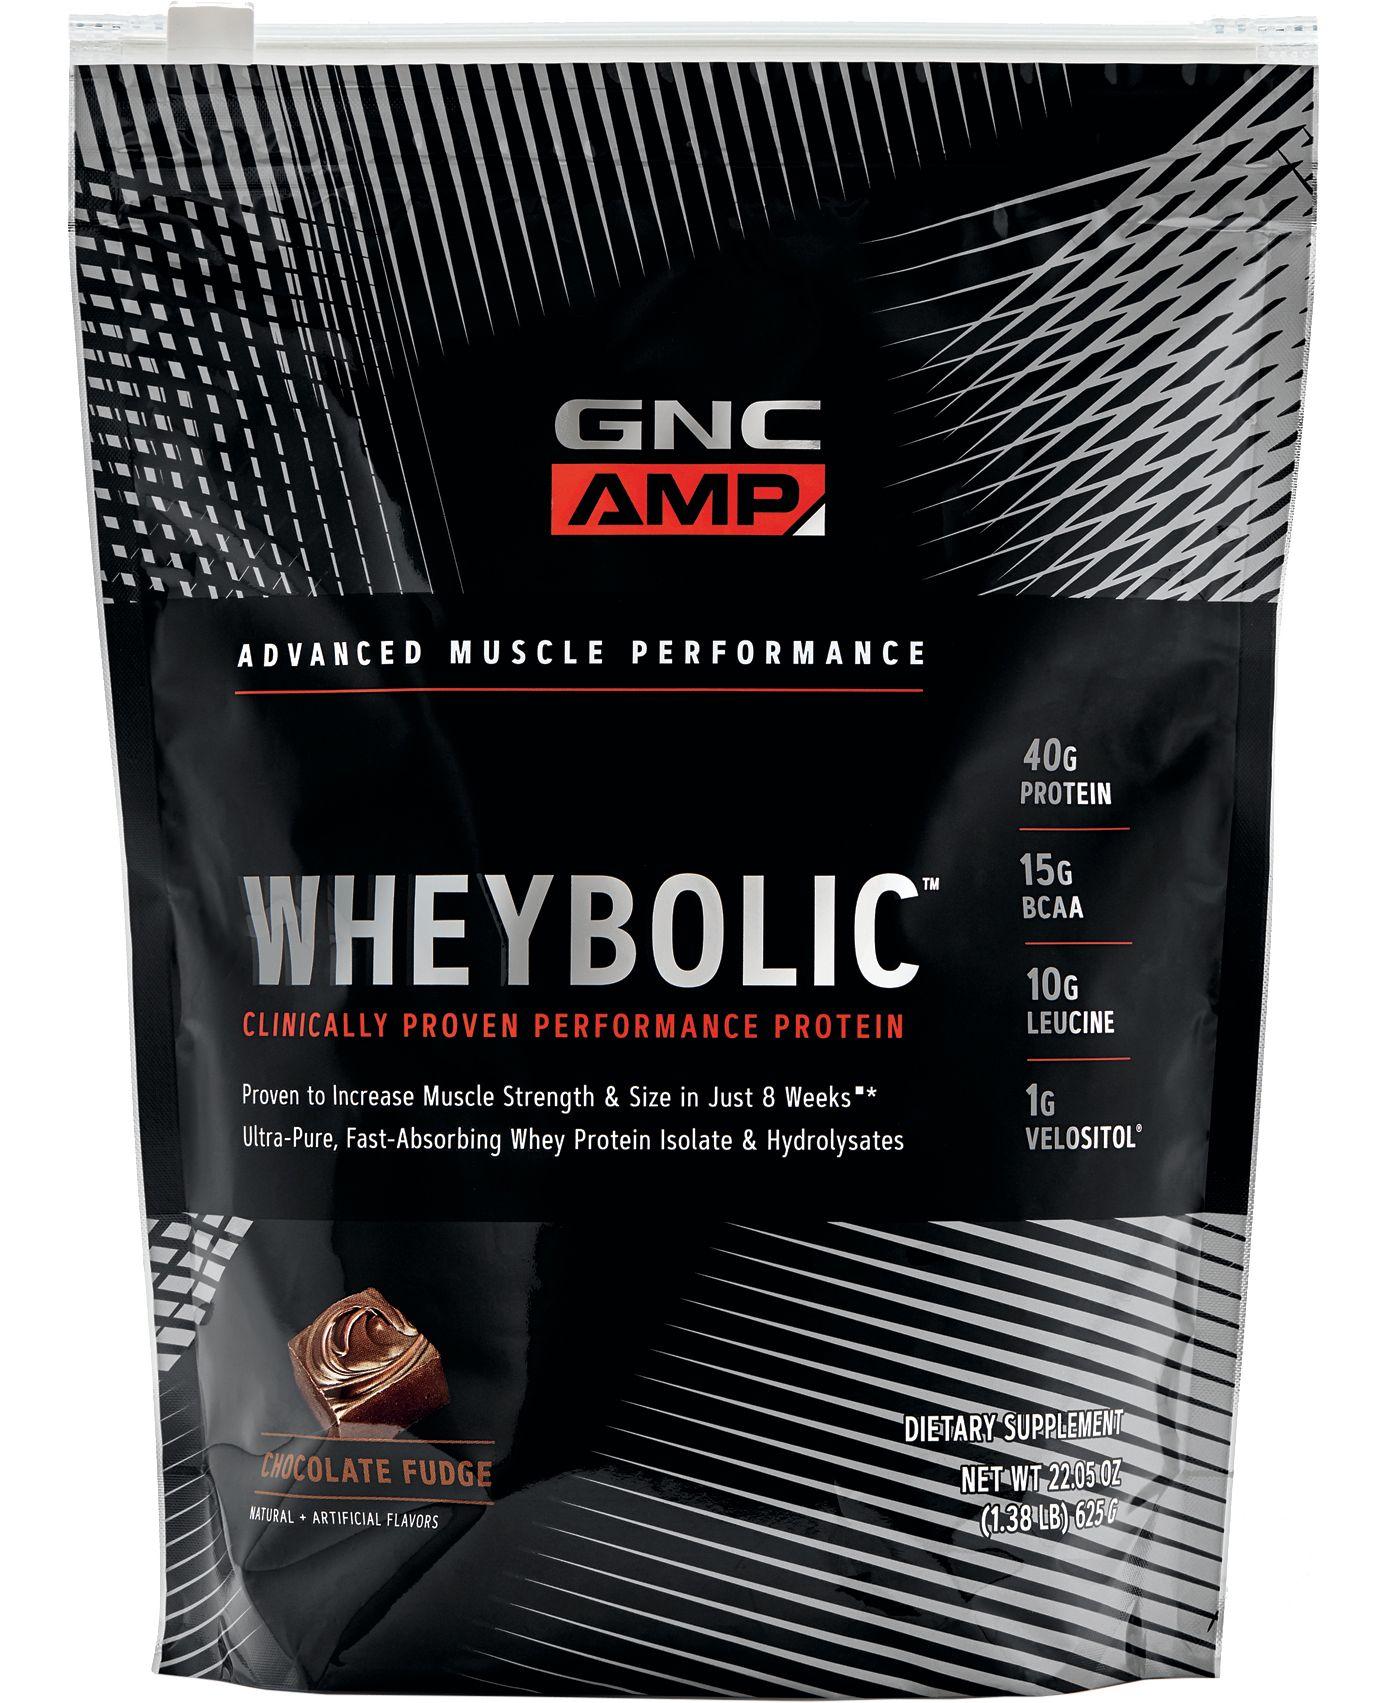 GNC AMP Wheybolic Protein Chocolate Fudge 10 Servings